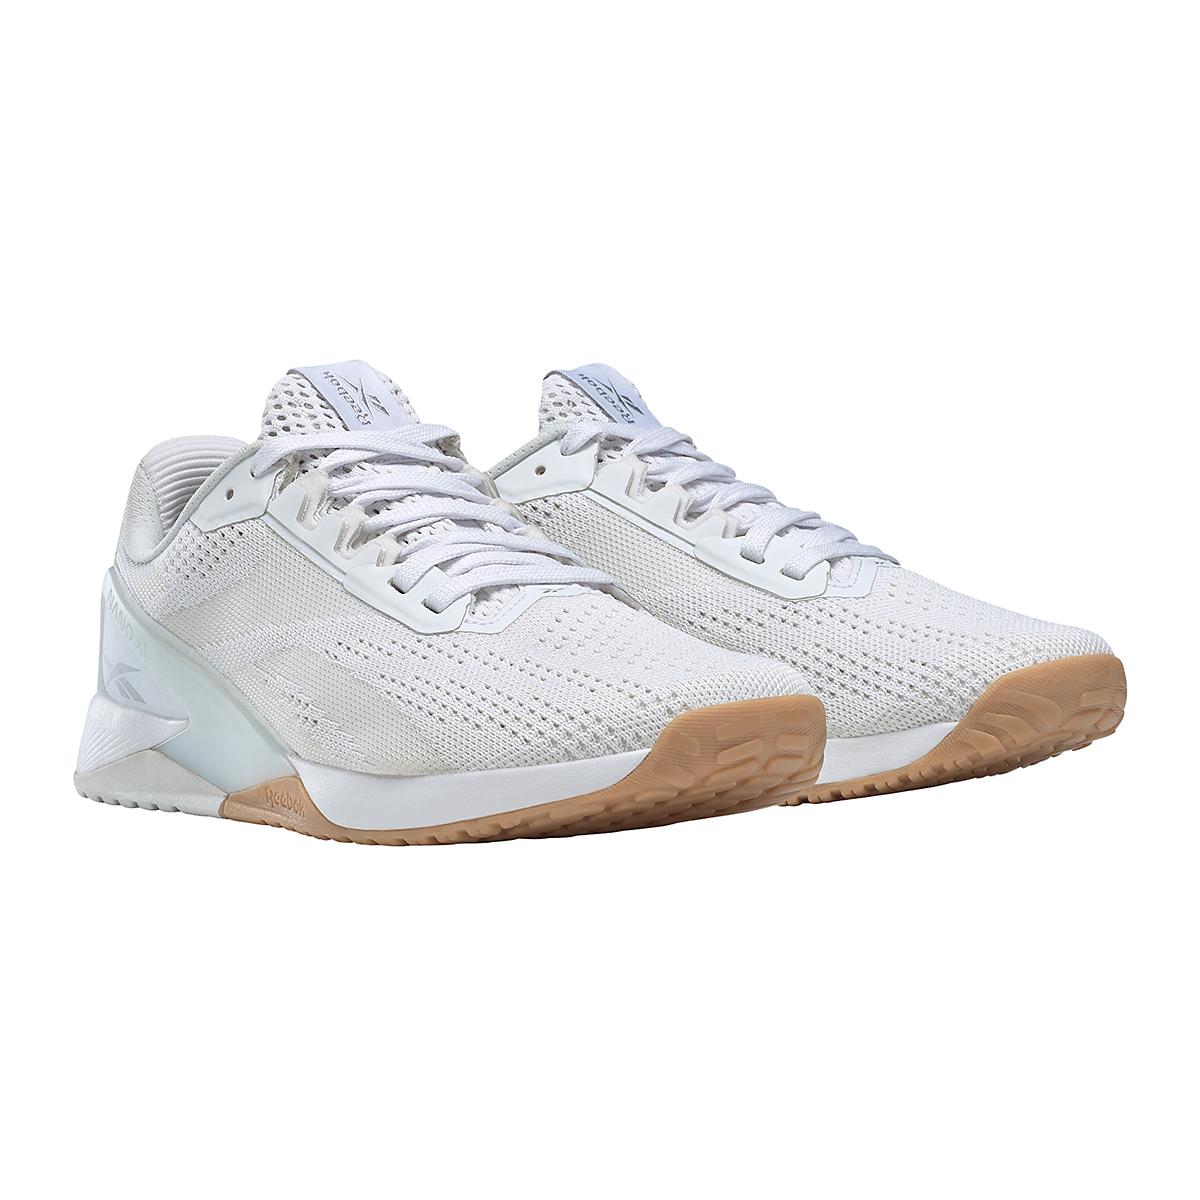 Women's Reebok Nano X1 Training Shoe - Color: White/True Grey/Rubber Gum - Size: 5 - Width: Regular, White/True Grey/Rubber Gum, large, image 3